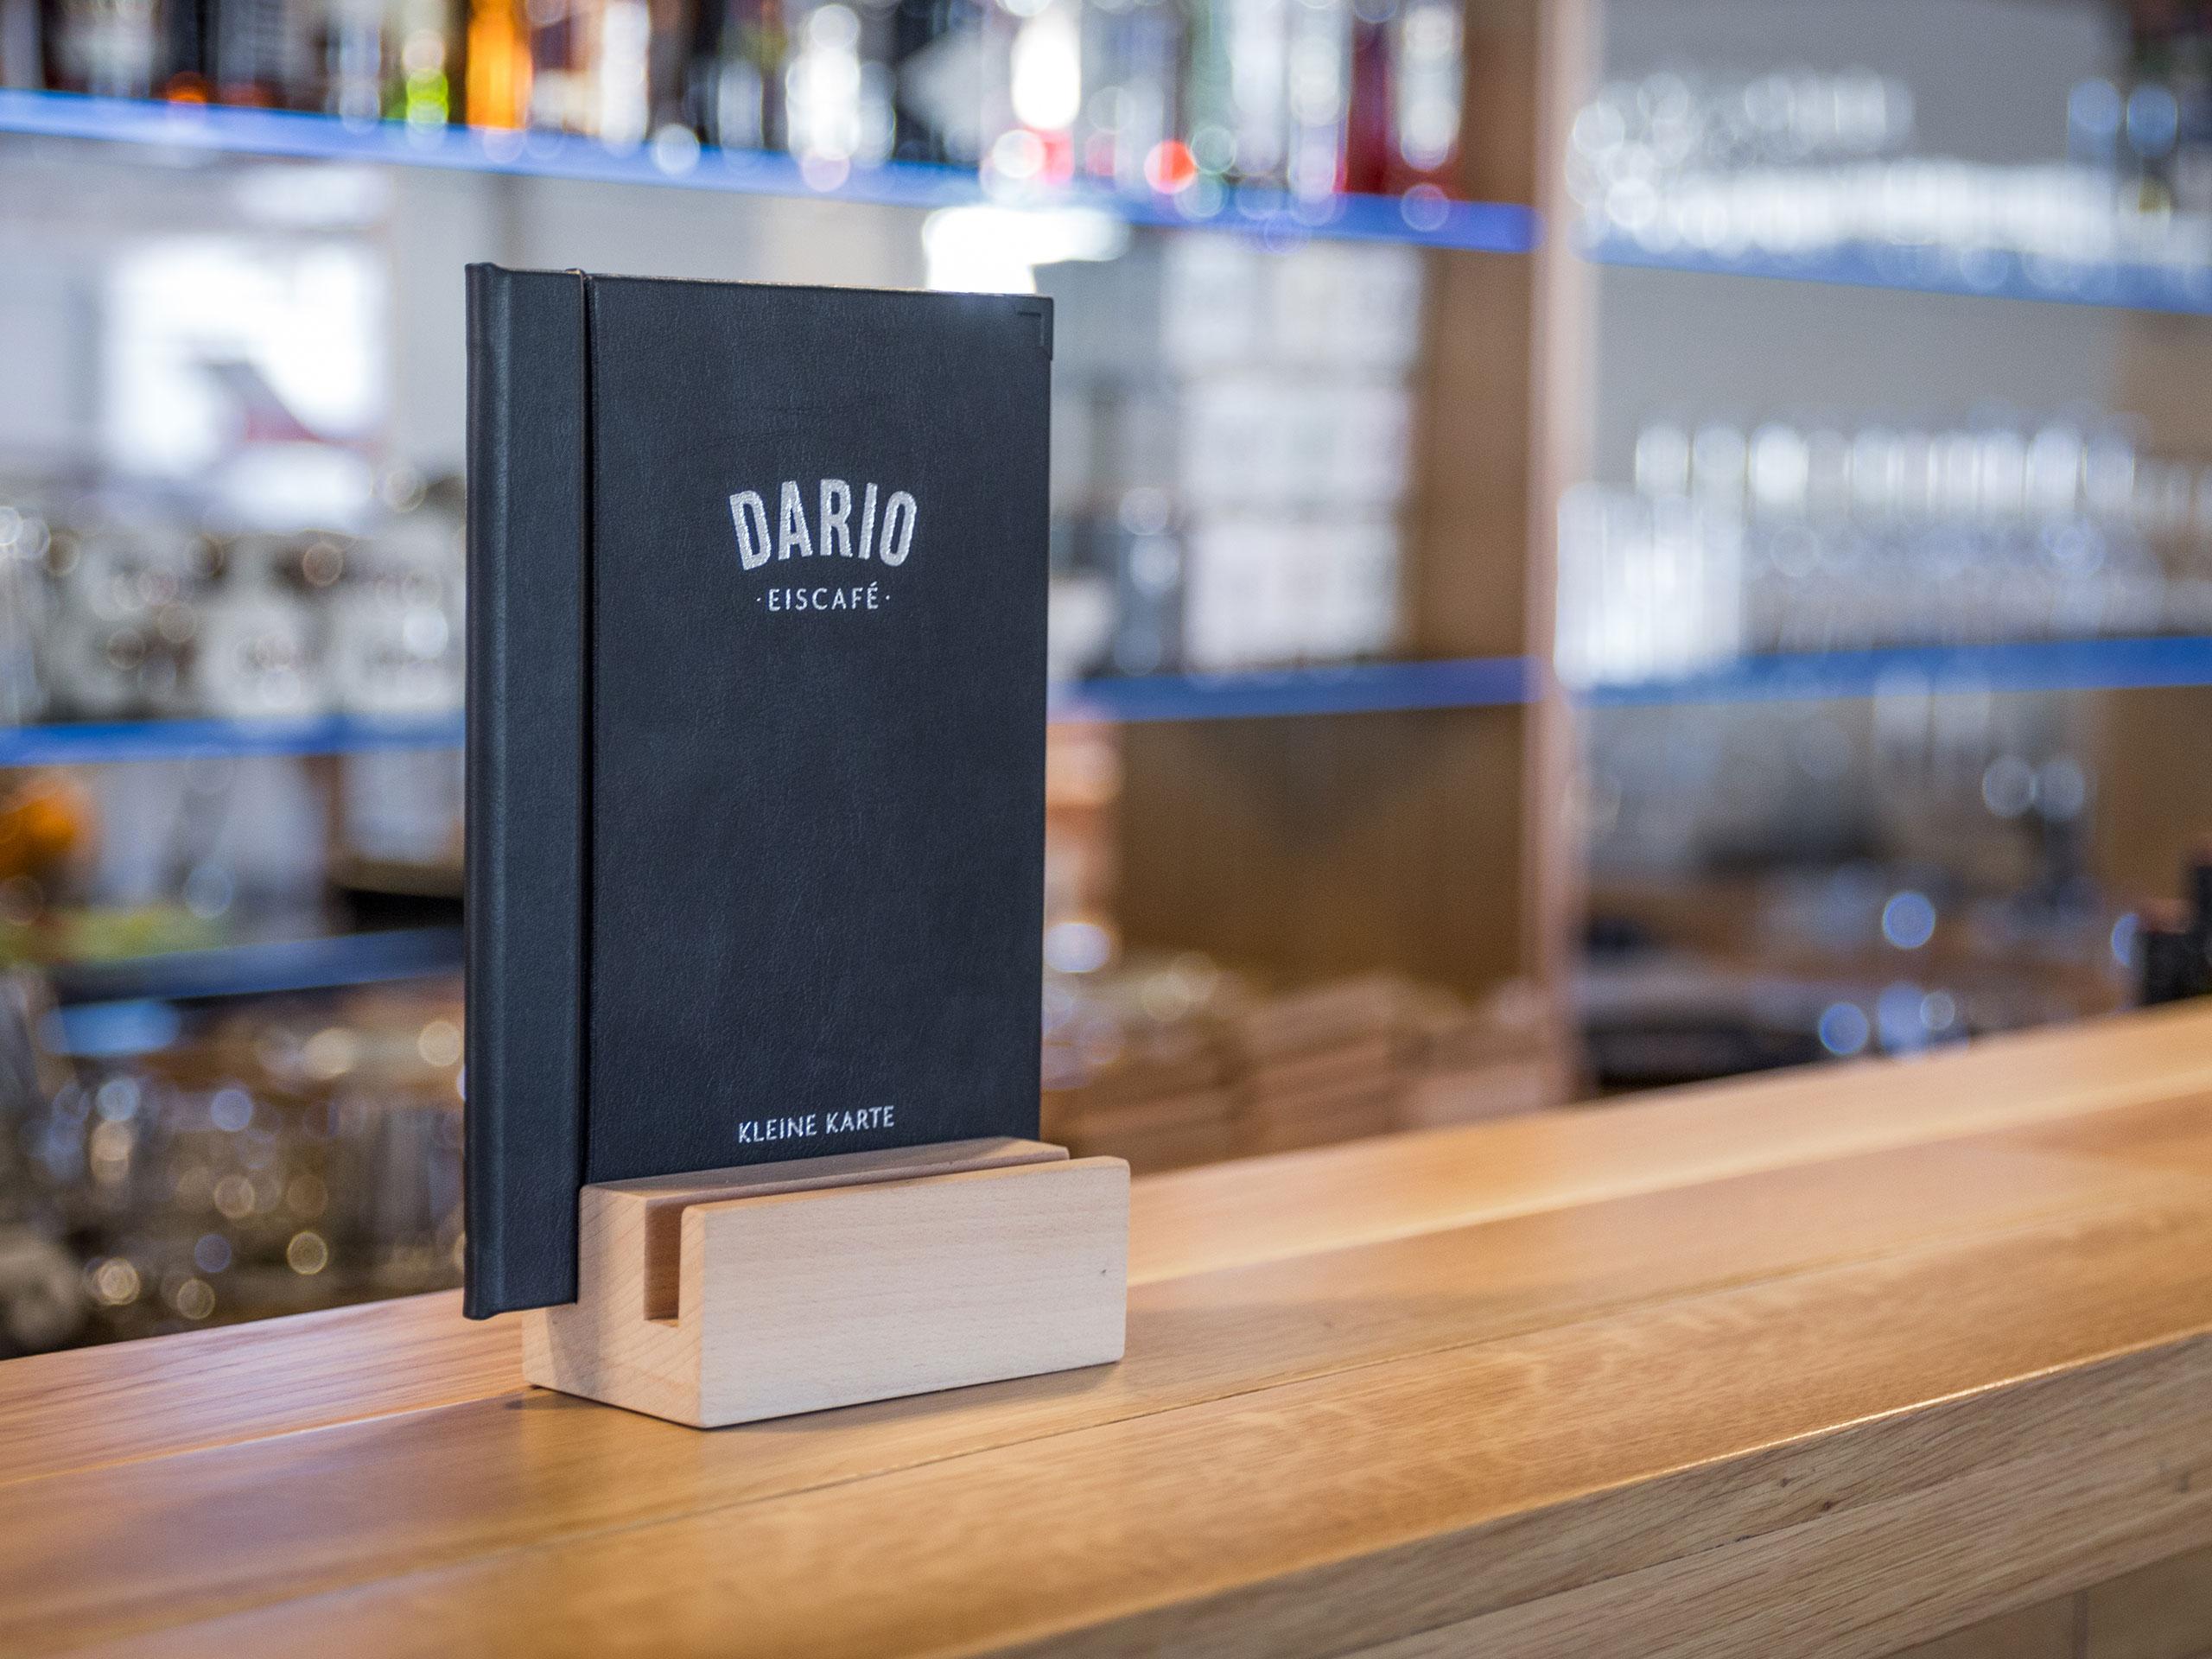 Dario Eiscafé – Kleine Karte